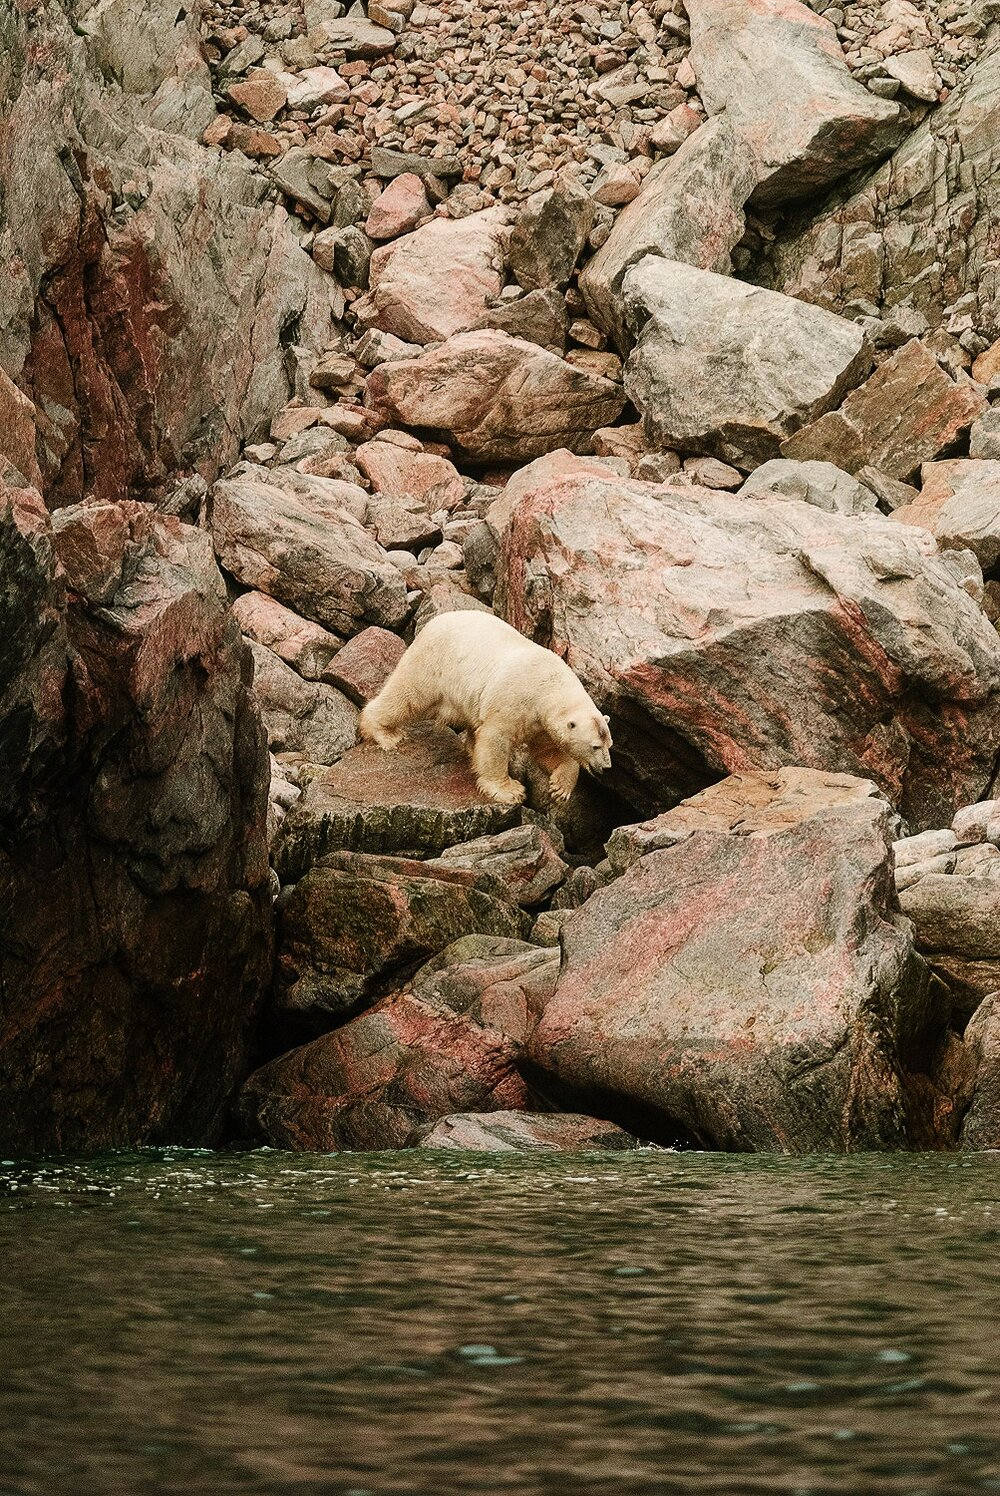 Stranded Polar Bear Entering The Sea - Nunavut, Canadian Arctic